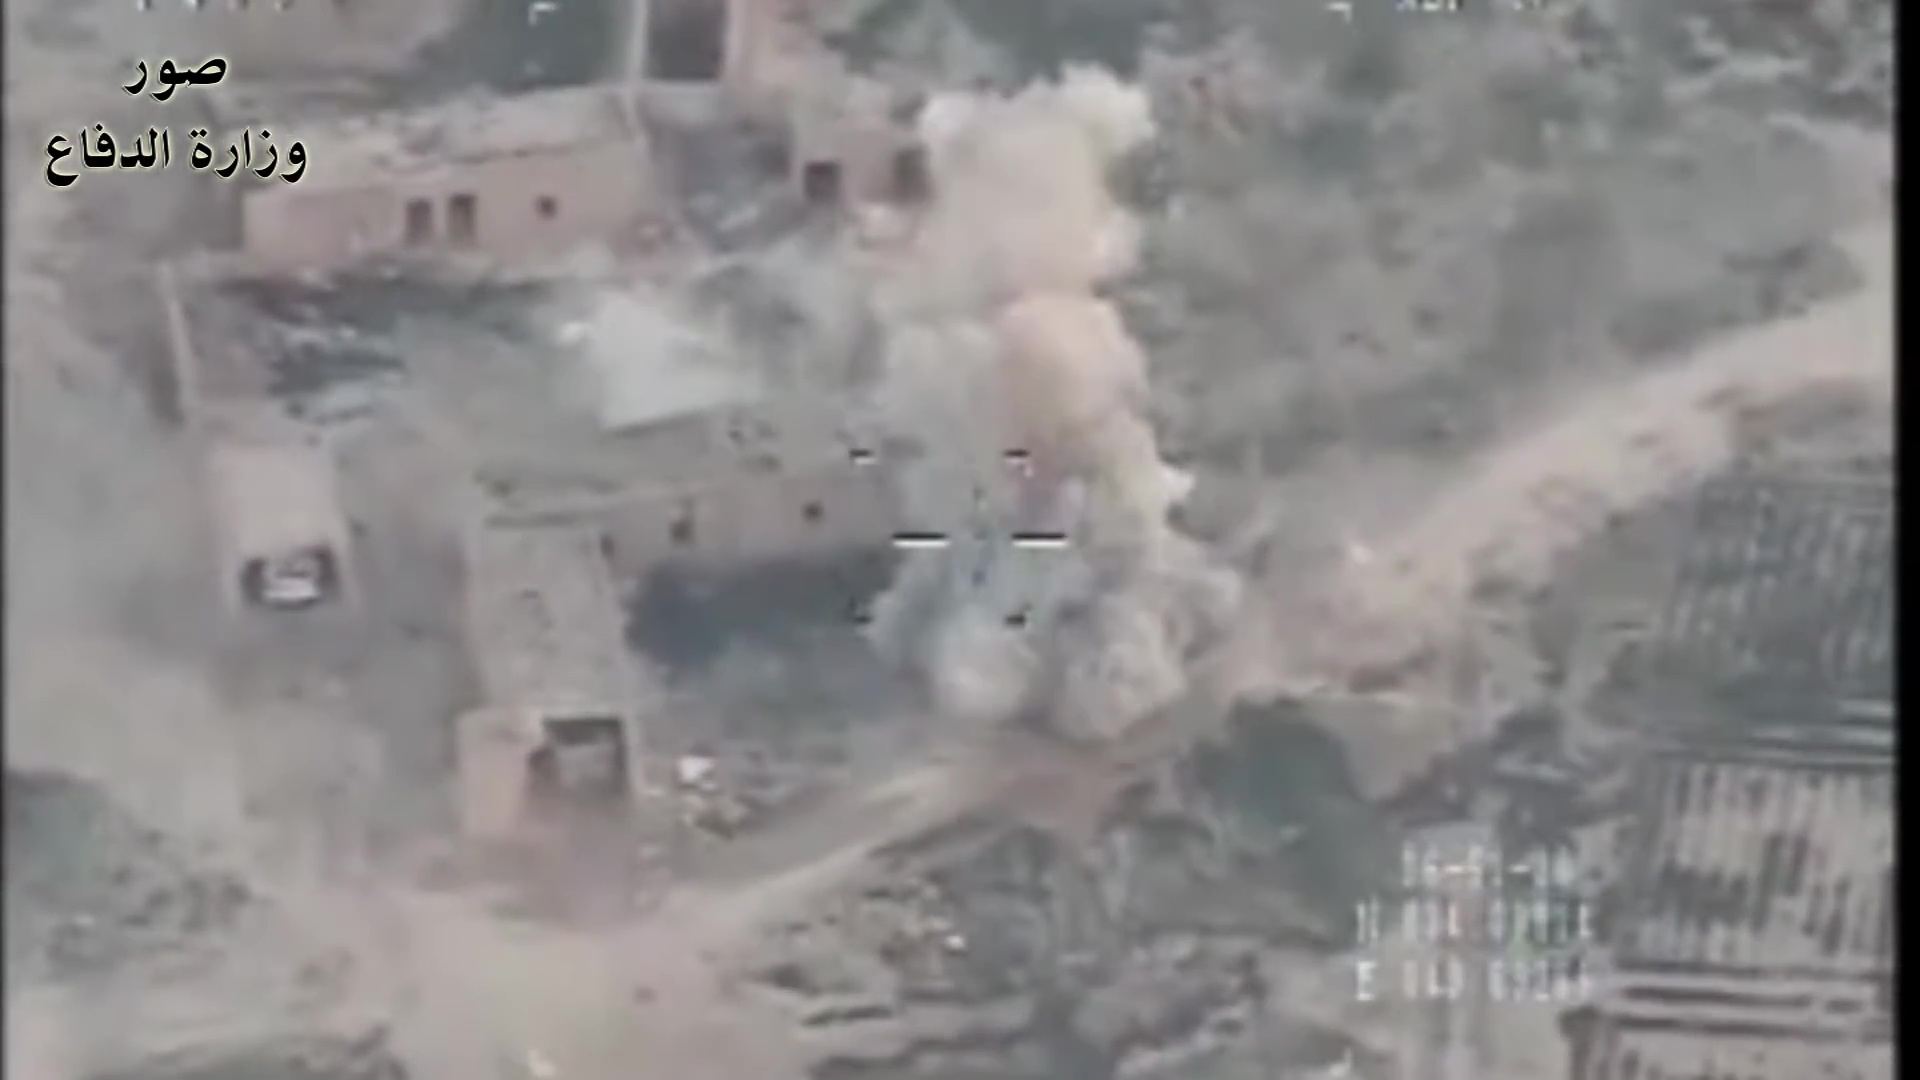 مسابقة رمضان الطائرات دون طيار  2018-02-18-Les-officiers-irakiens-parlent-du-drone-CH-4-06